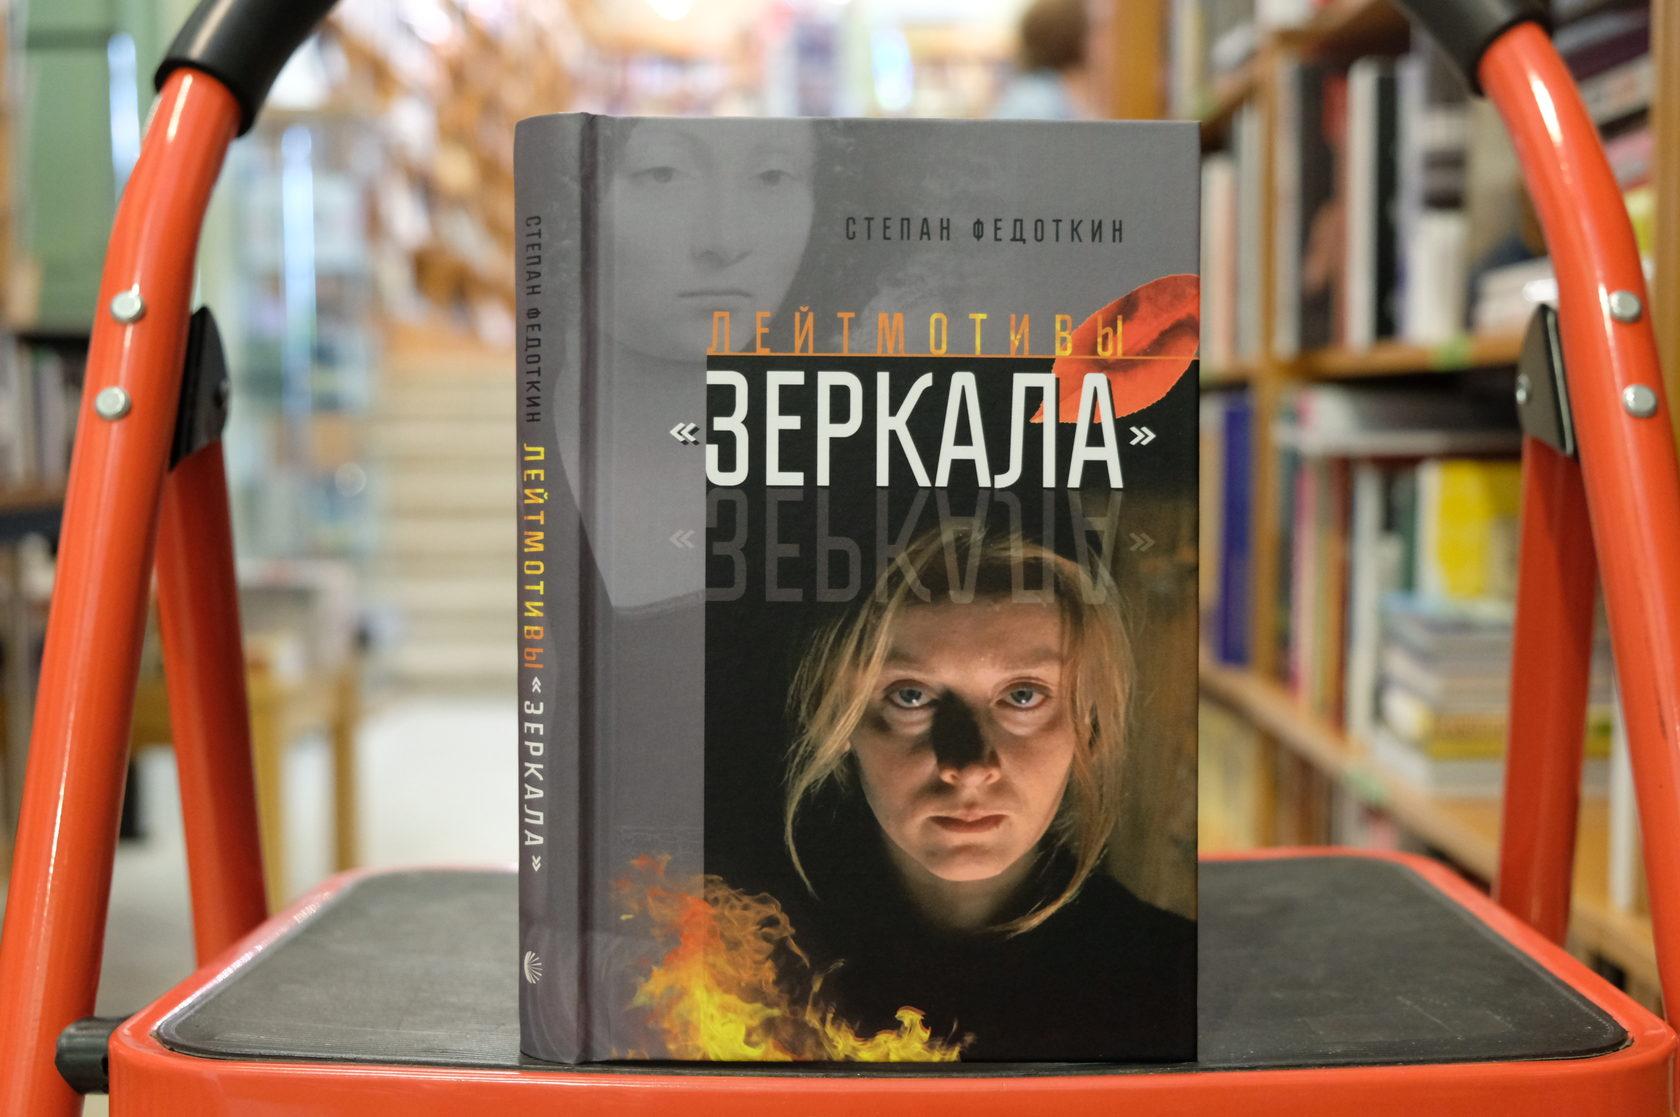 "Купить книгу «Лейтмотивы ""Зеркала""» 978-5-88373-549-2"